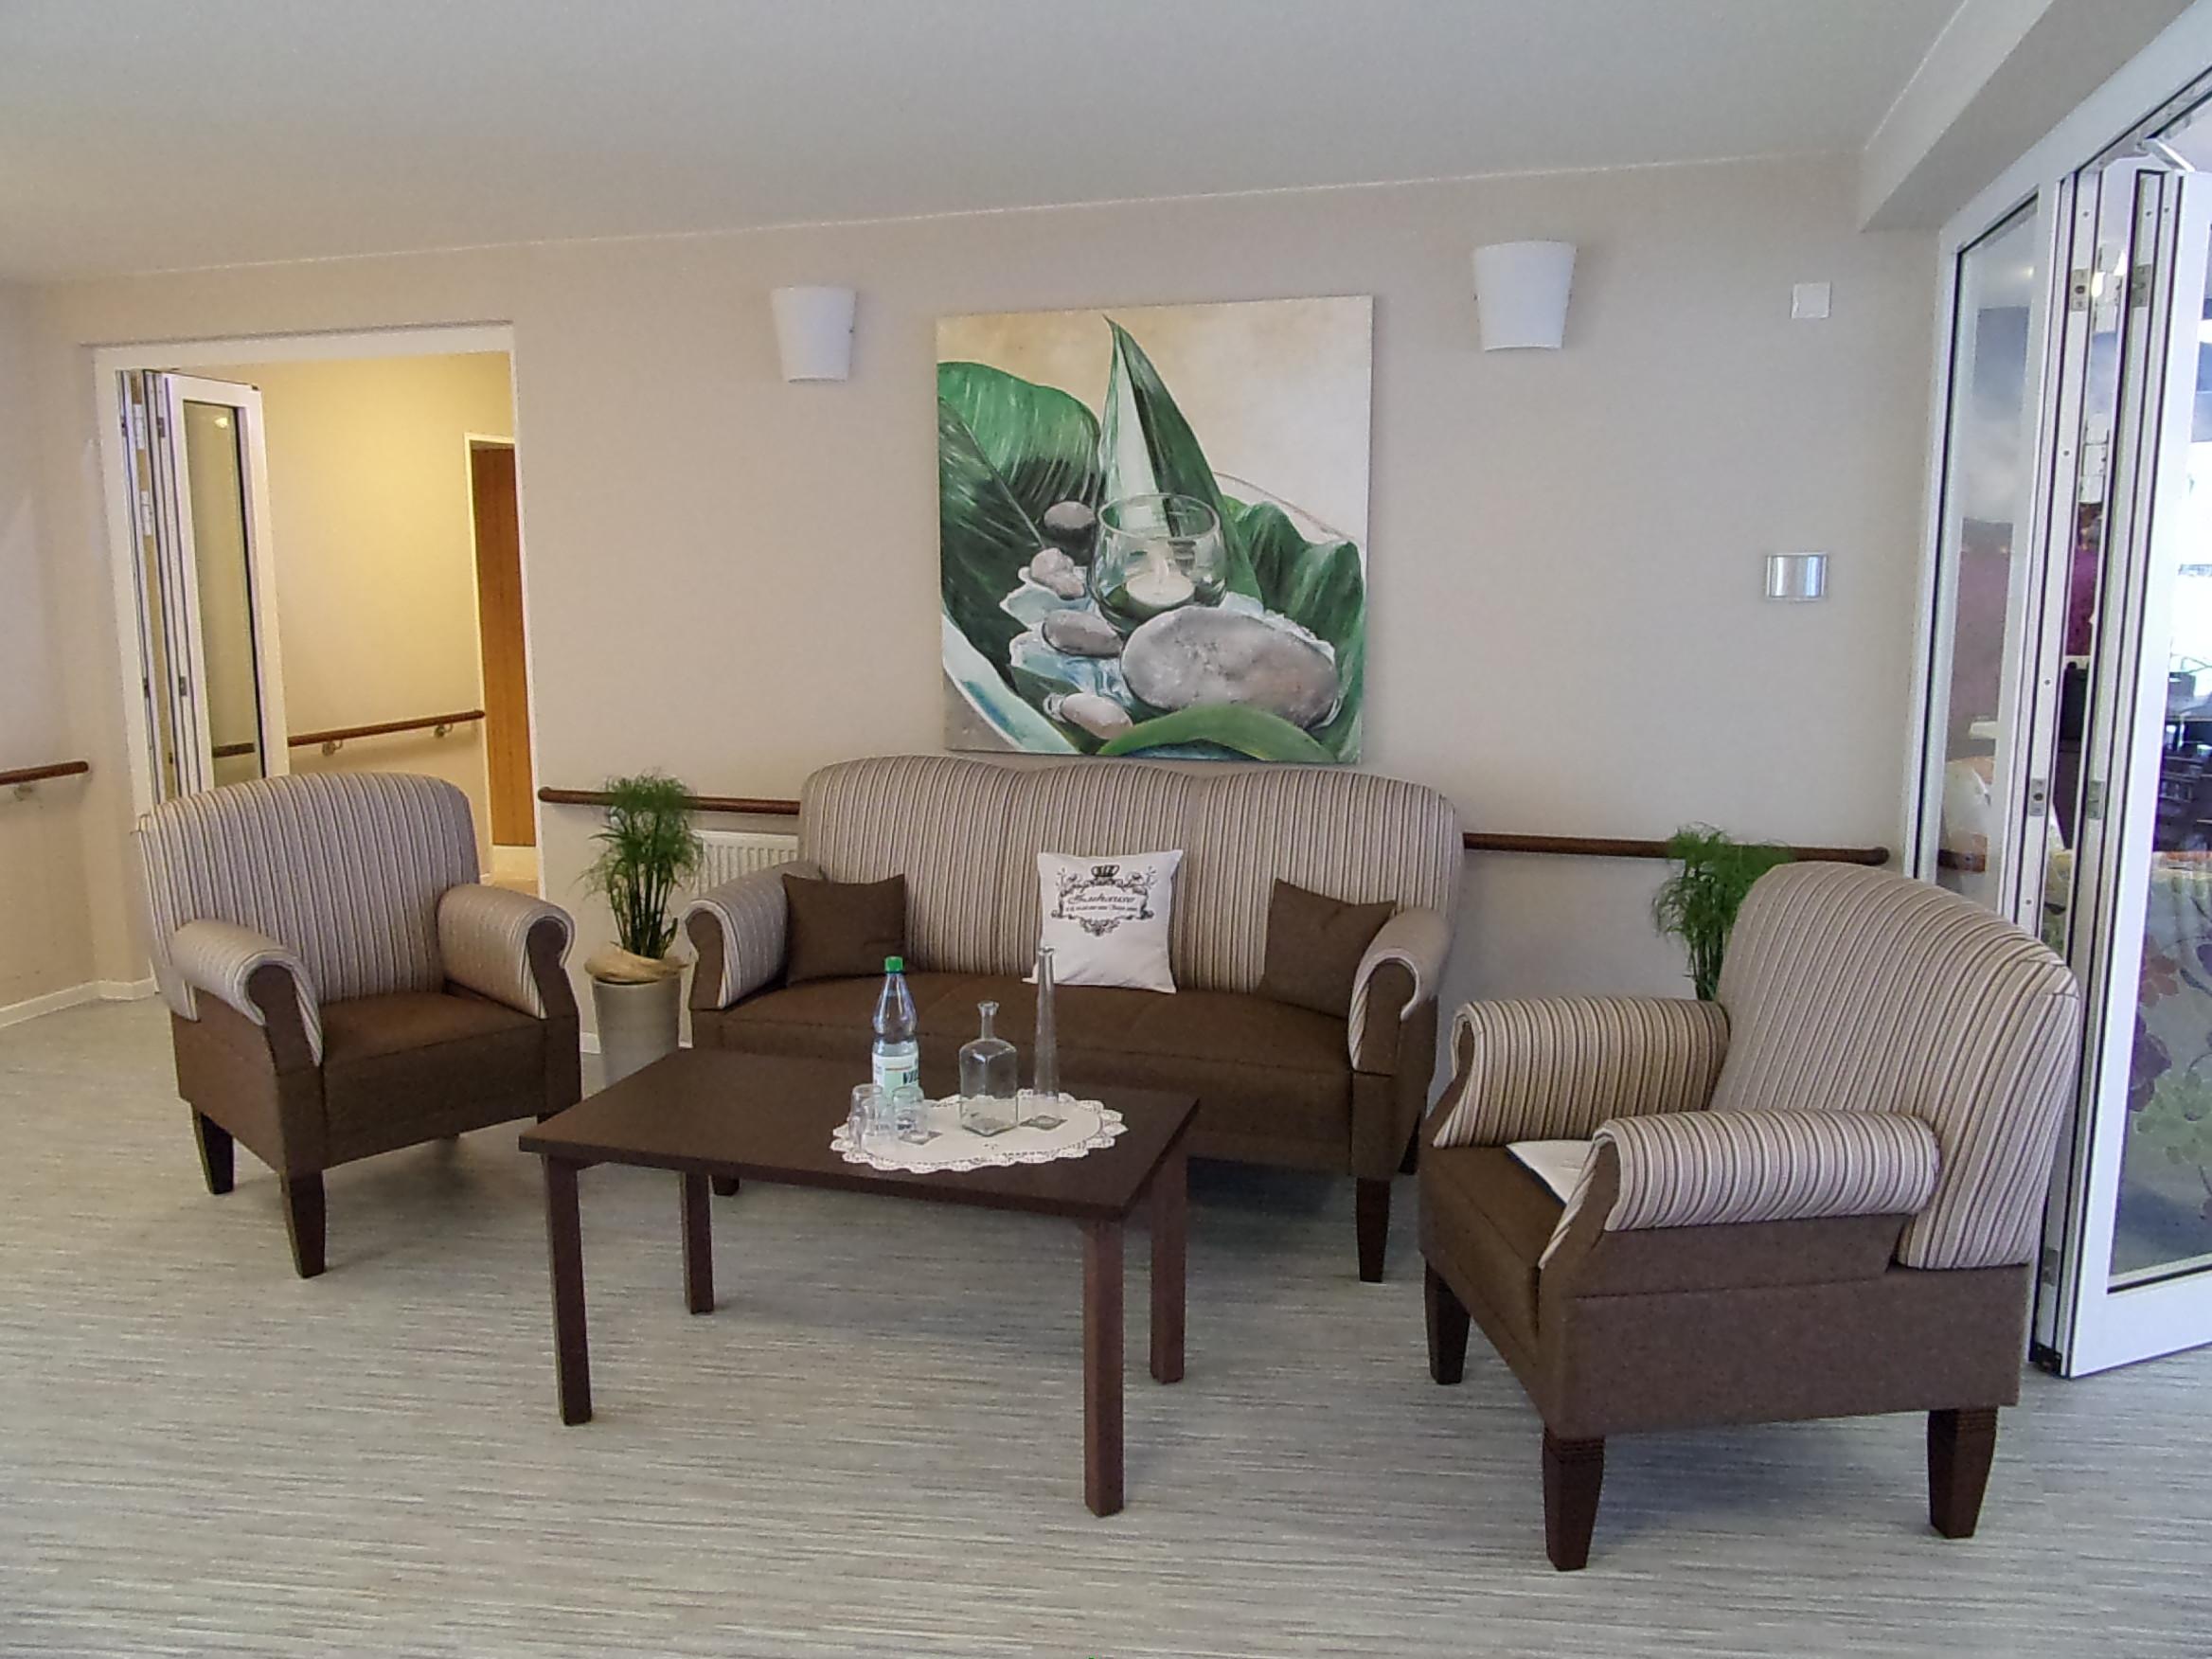 pflegewohnen auf dem b lt b rgerhilfe landesverband niedersachsen e v. Black Bedroom Furniture Sets. Home Design Ideas